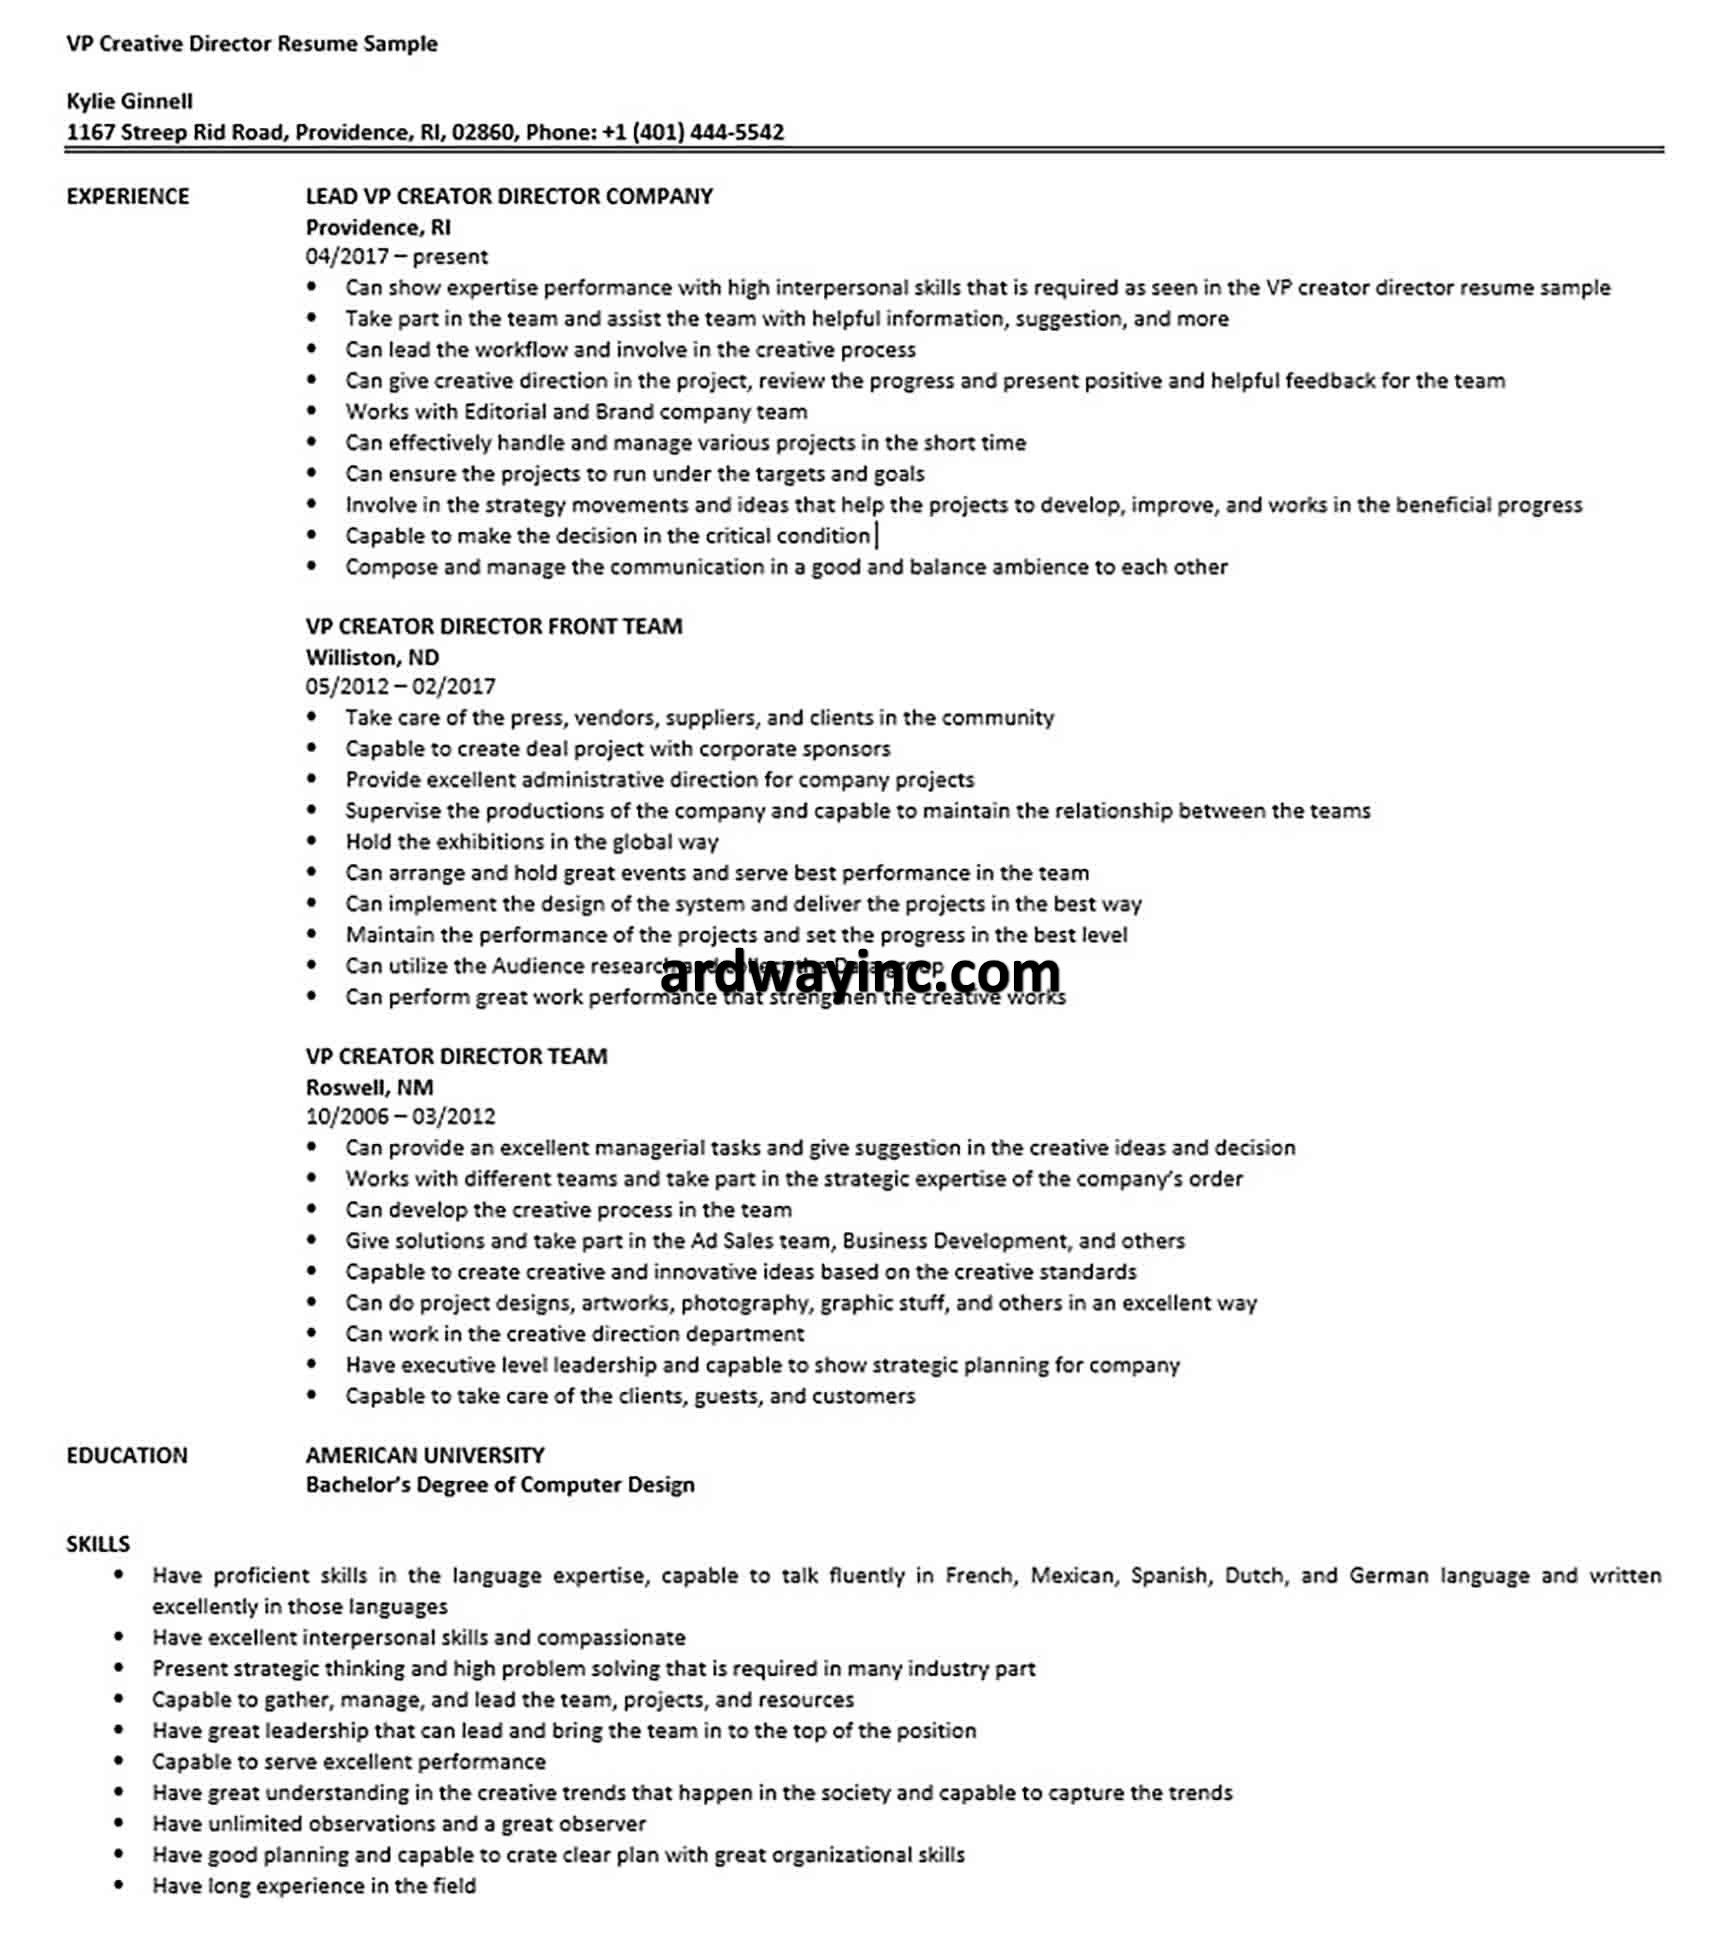 Vp Creative Director Resume Sample Interpersonal Skills Creative Director Resume